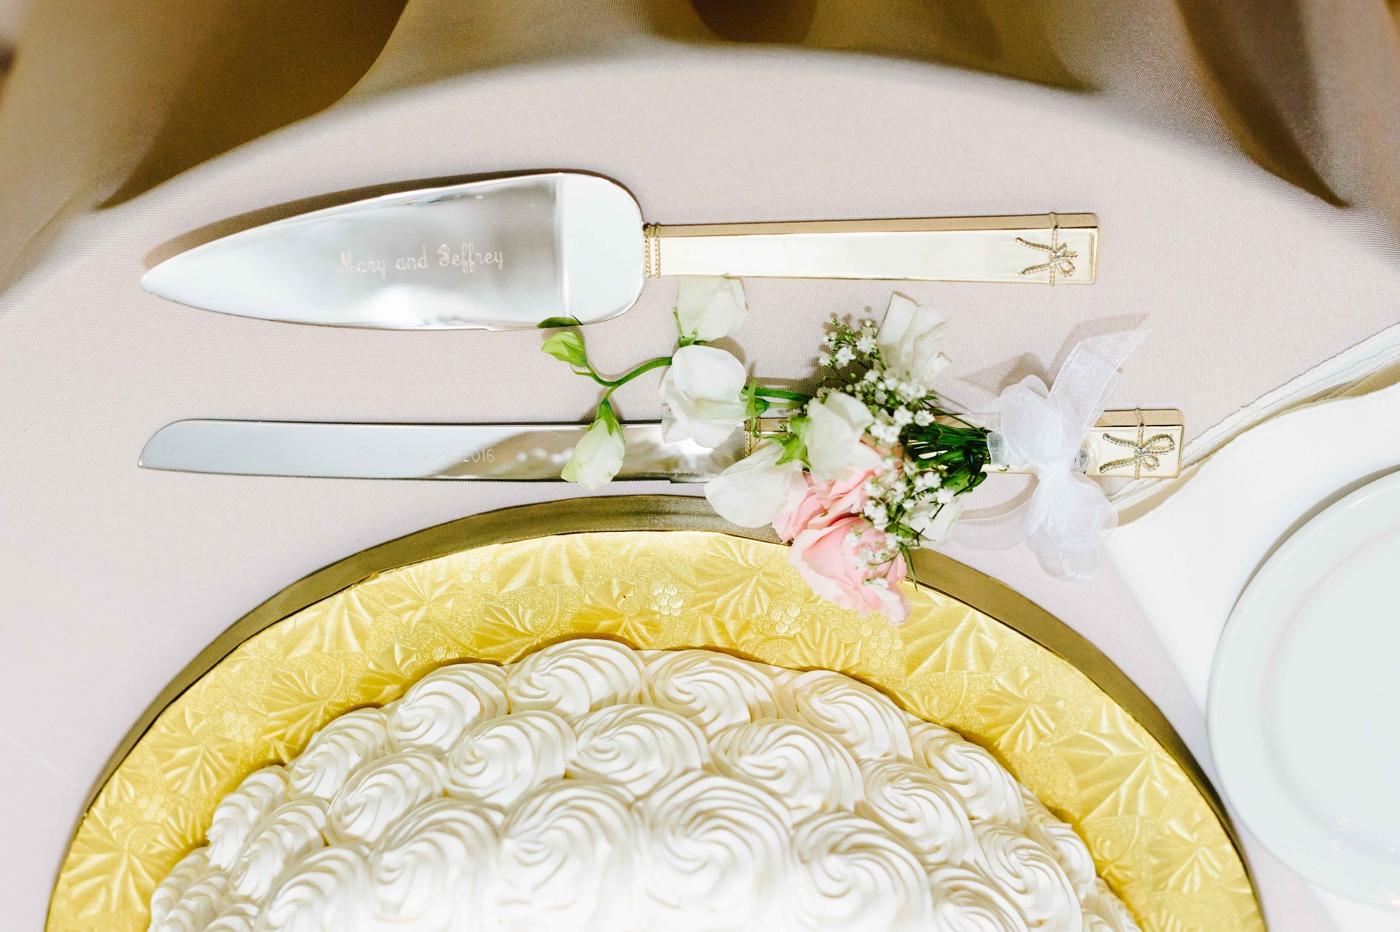 chicago-fine-art-wedding-photography-svihra21